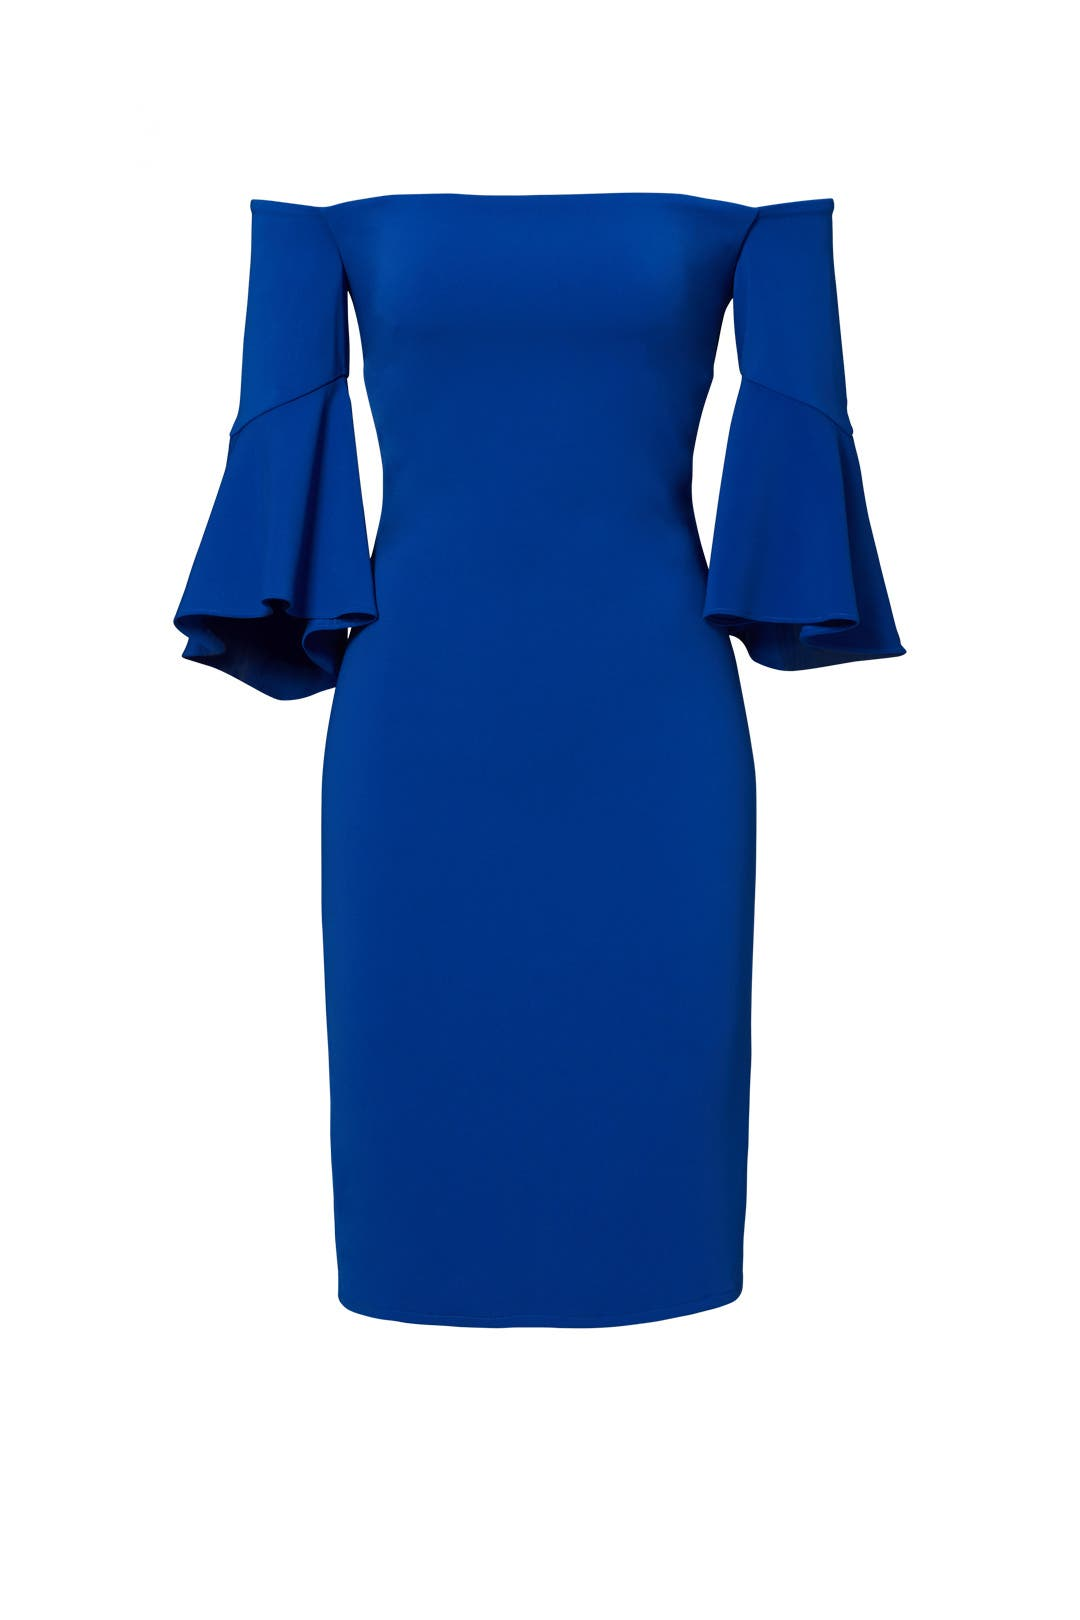 Laundry by shelli segal navy blue dress